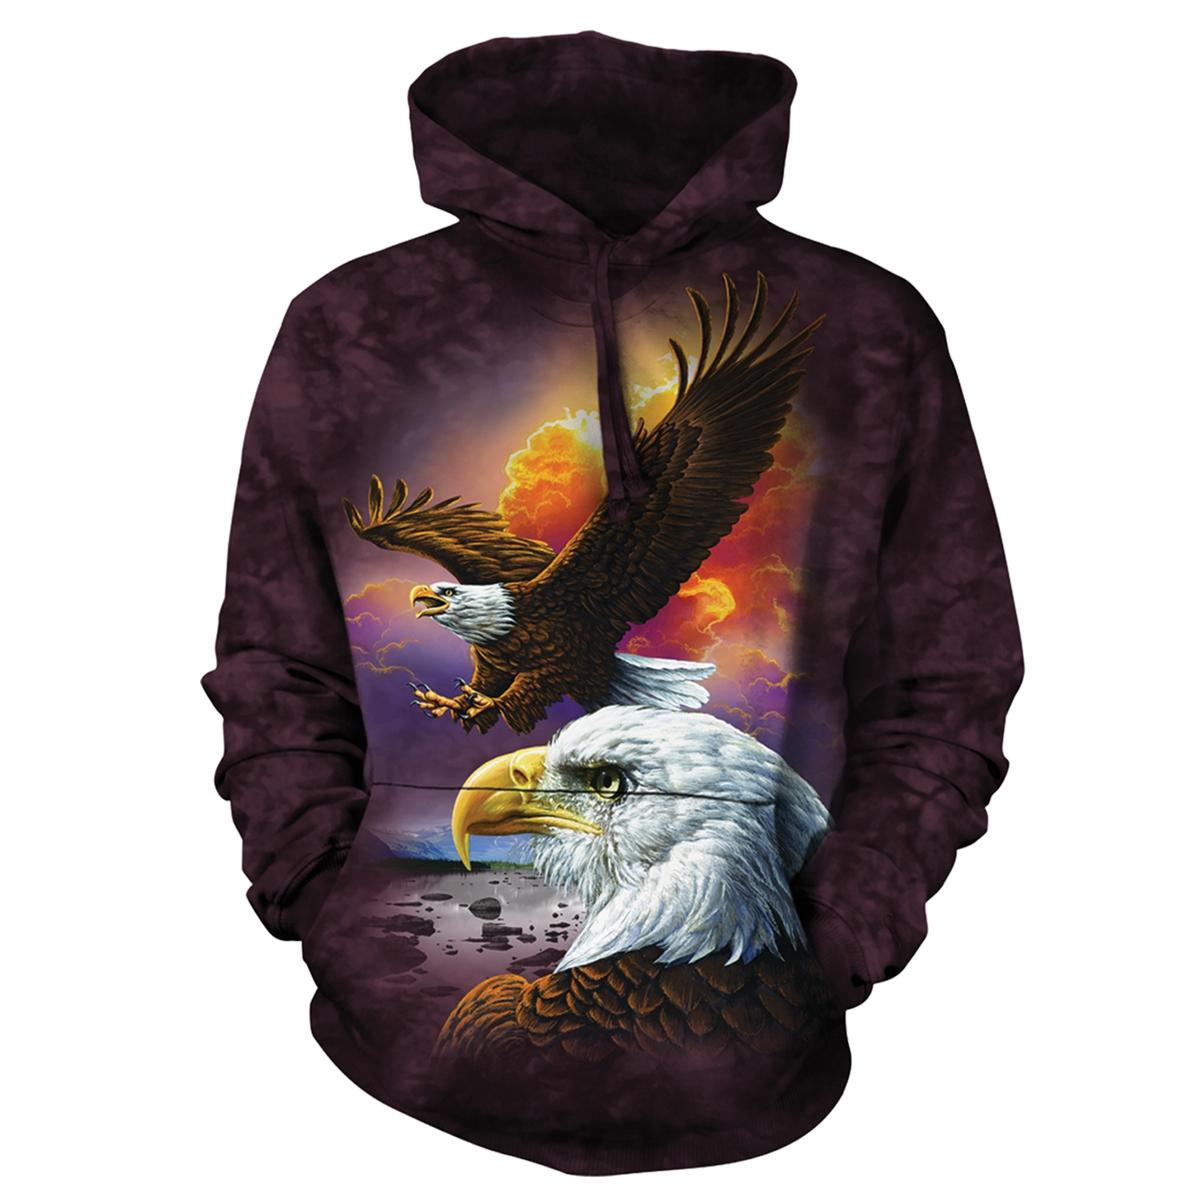 Soaring Eagle Hooded Pullover